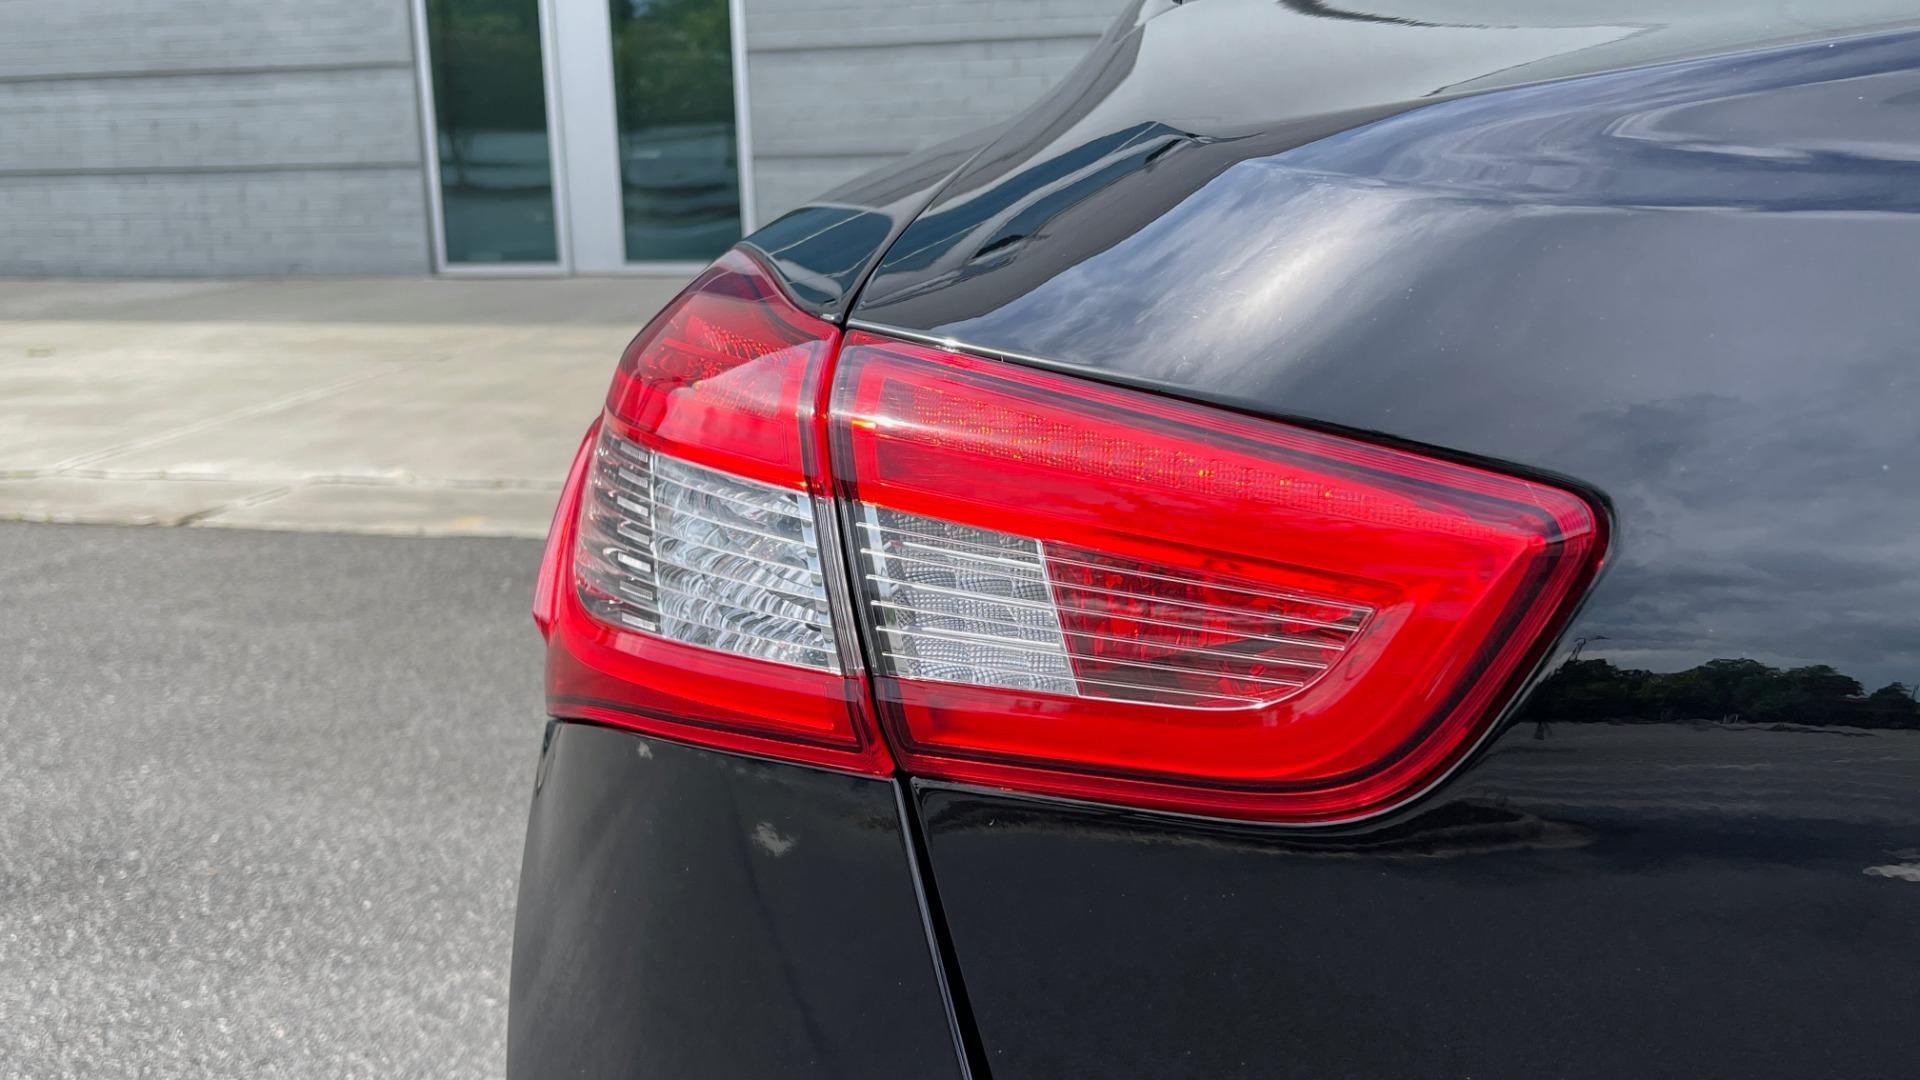 Used 2018 Maserati GHIBLI 3.0L SEDAN / 8-SPD AUTO / NAV / SUNROOF / REARVIEW for sale $42,995 at Formula Imports in Charlotte NC 28227 25